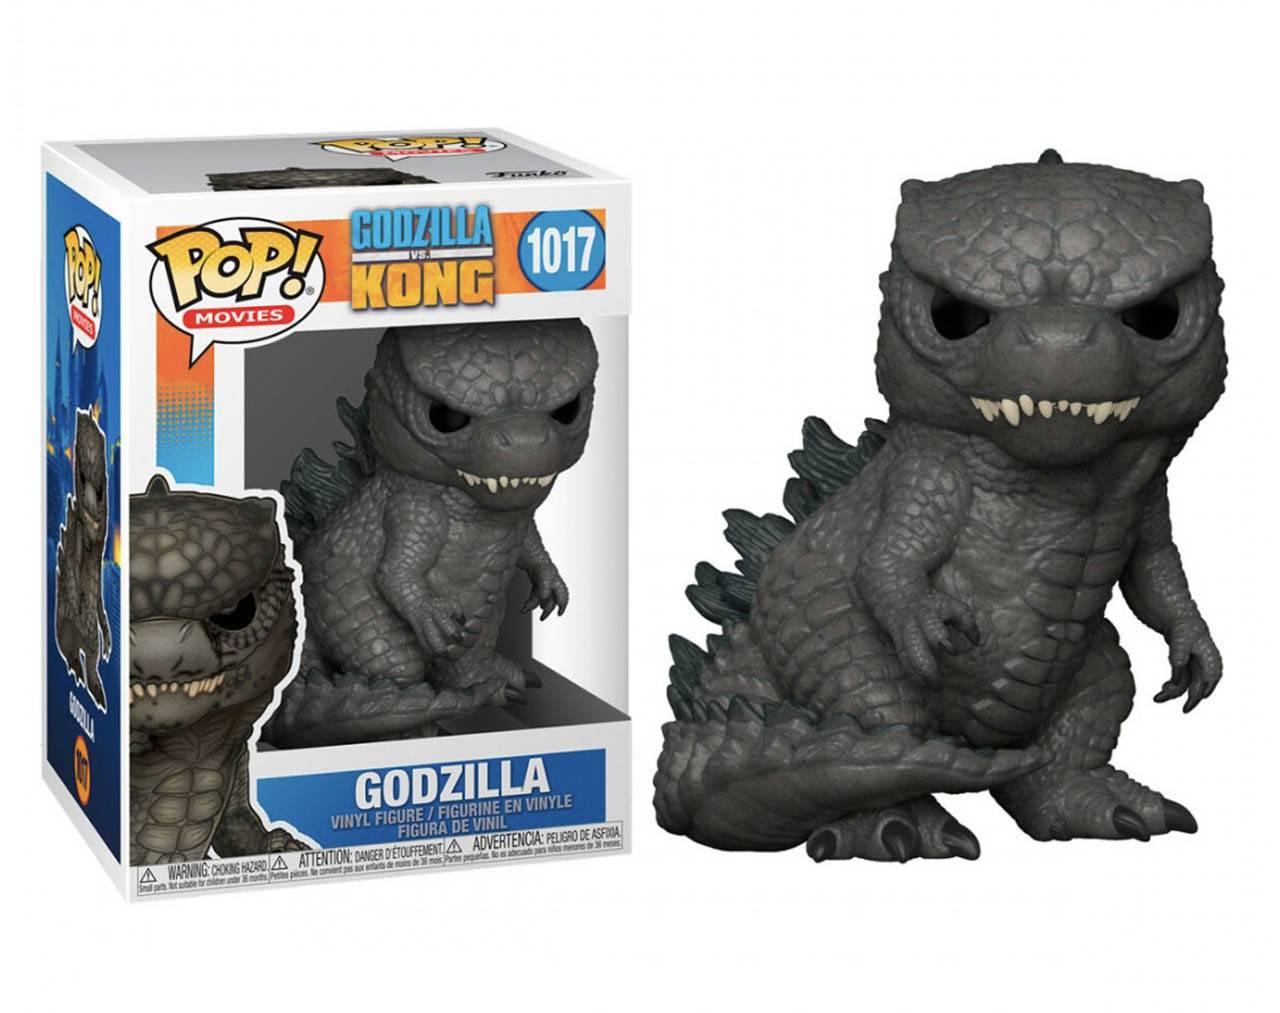 Godzilla Pop! Vinyl